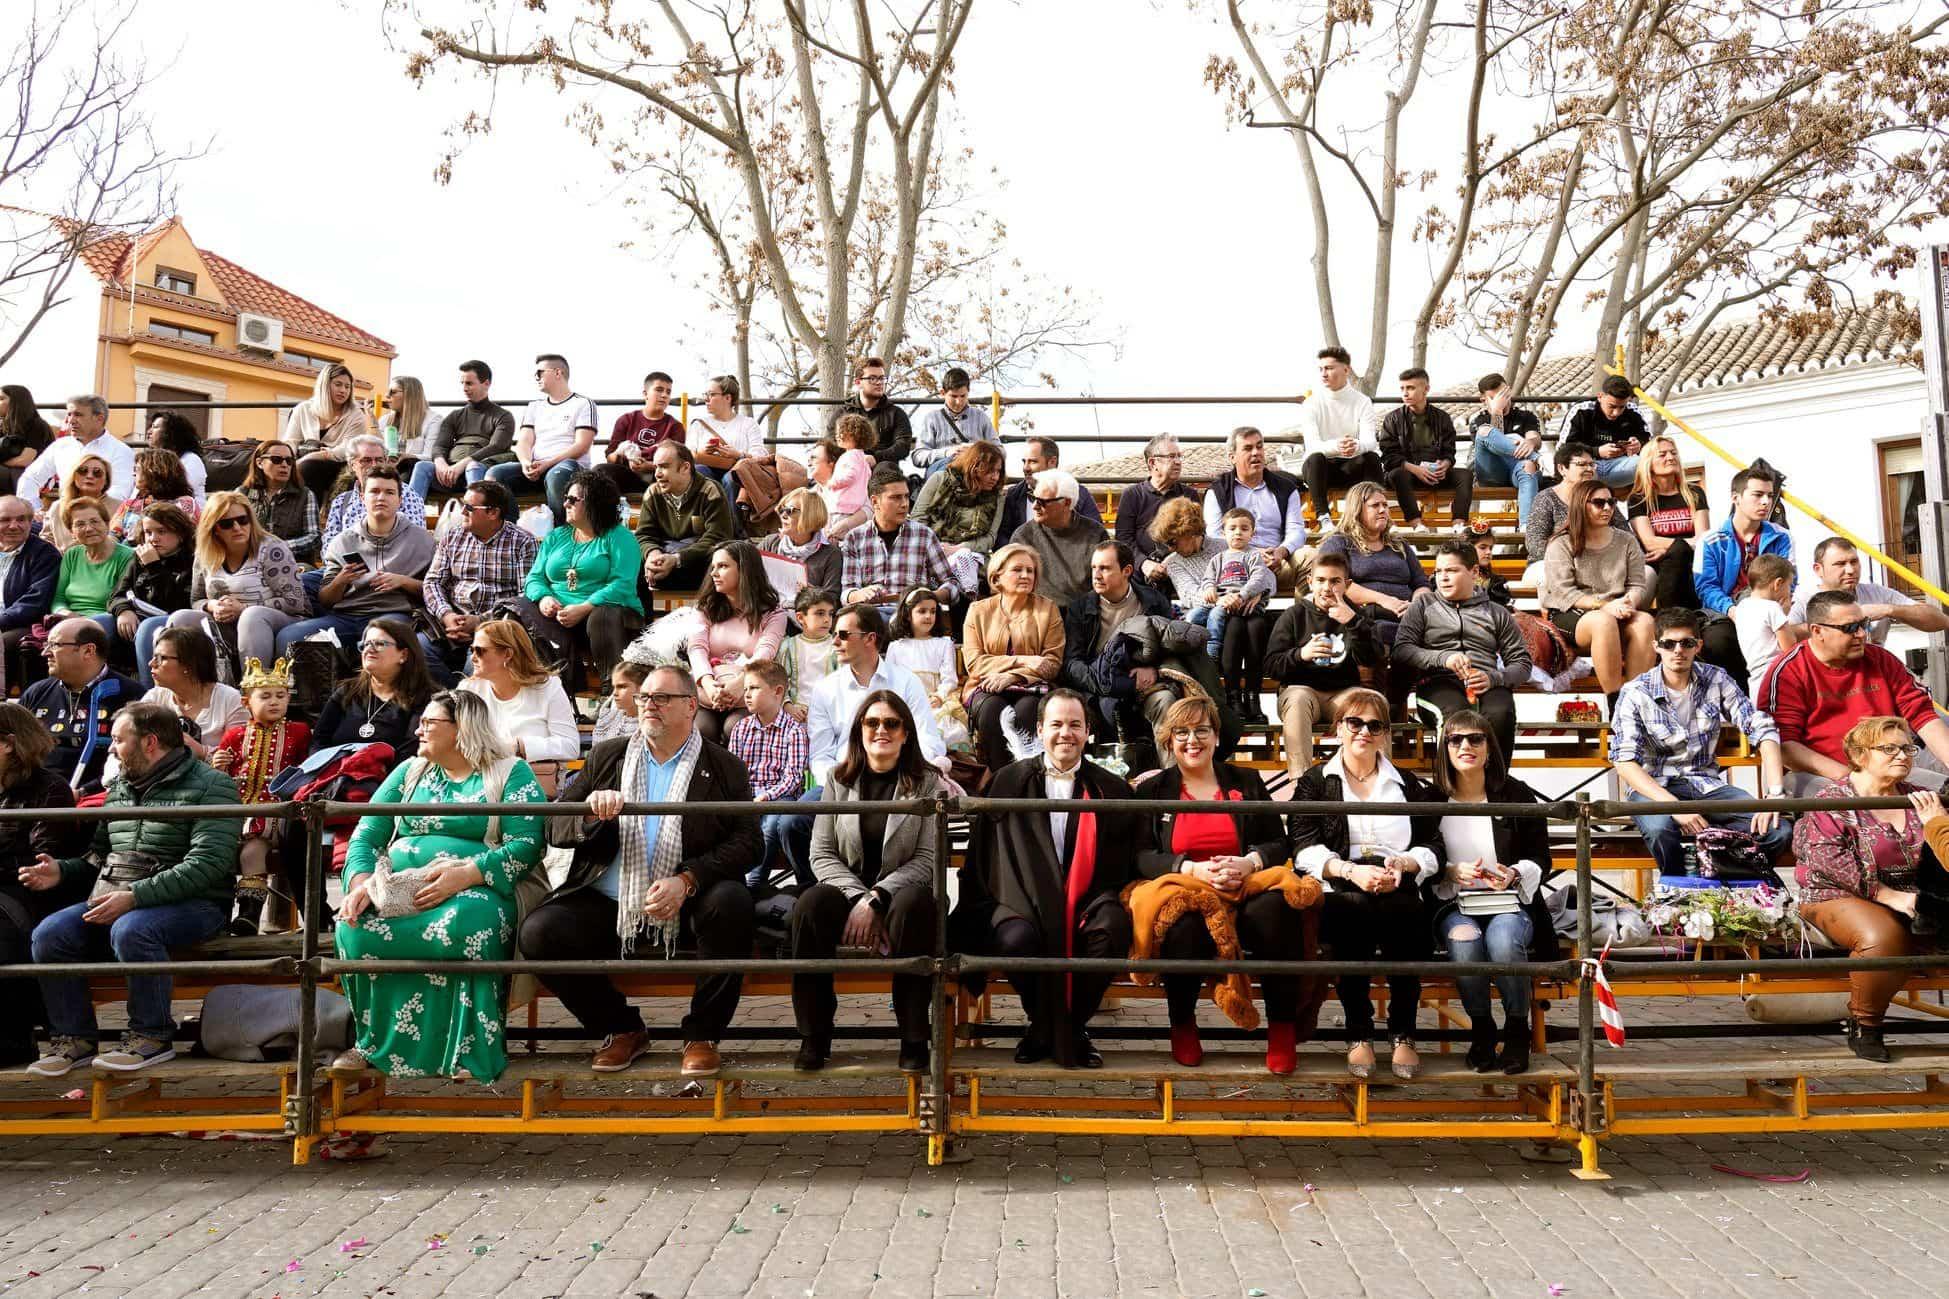 Carnaval de herencia 2020 ofertorio 66 - Selección de fotografías del Ofertorio del Carnaval de Herencia